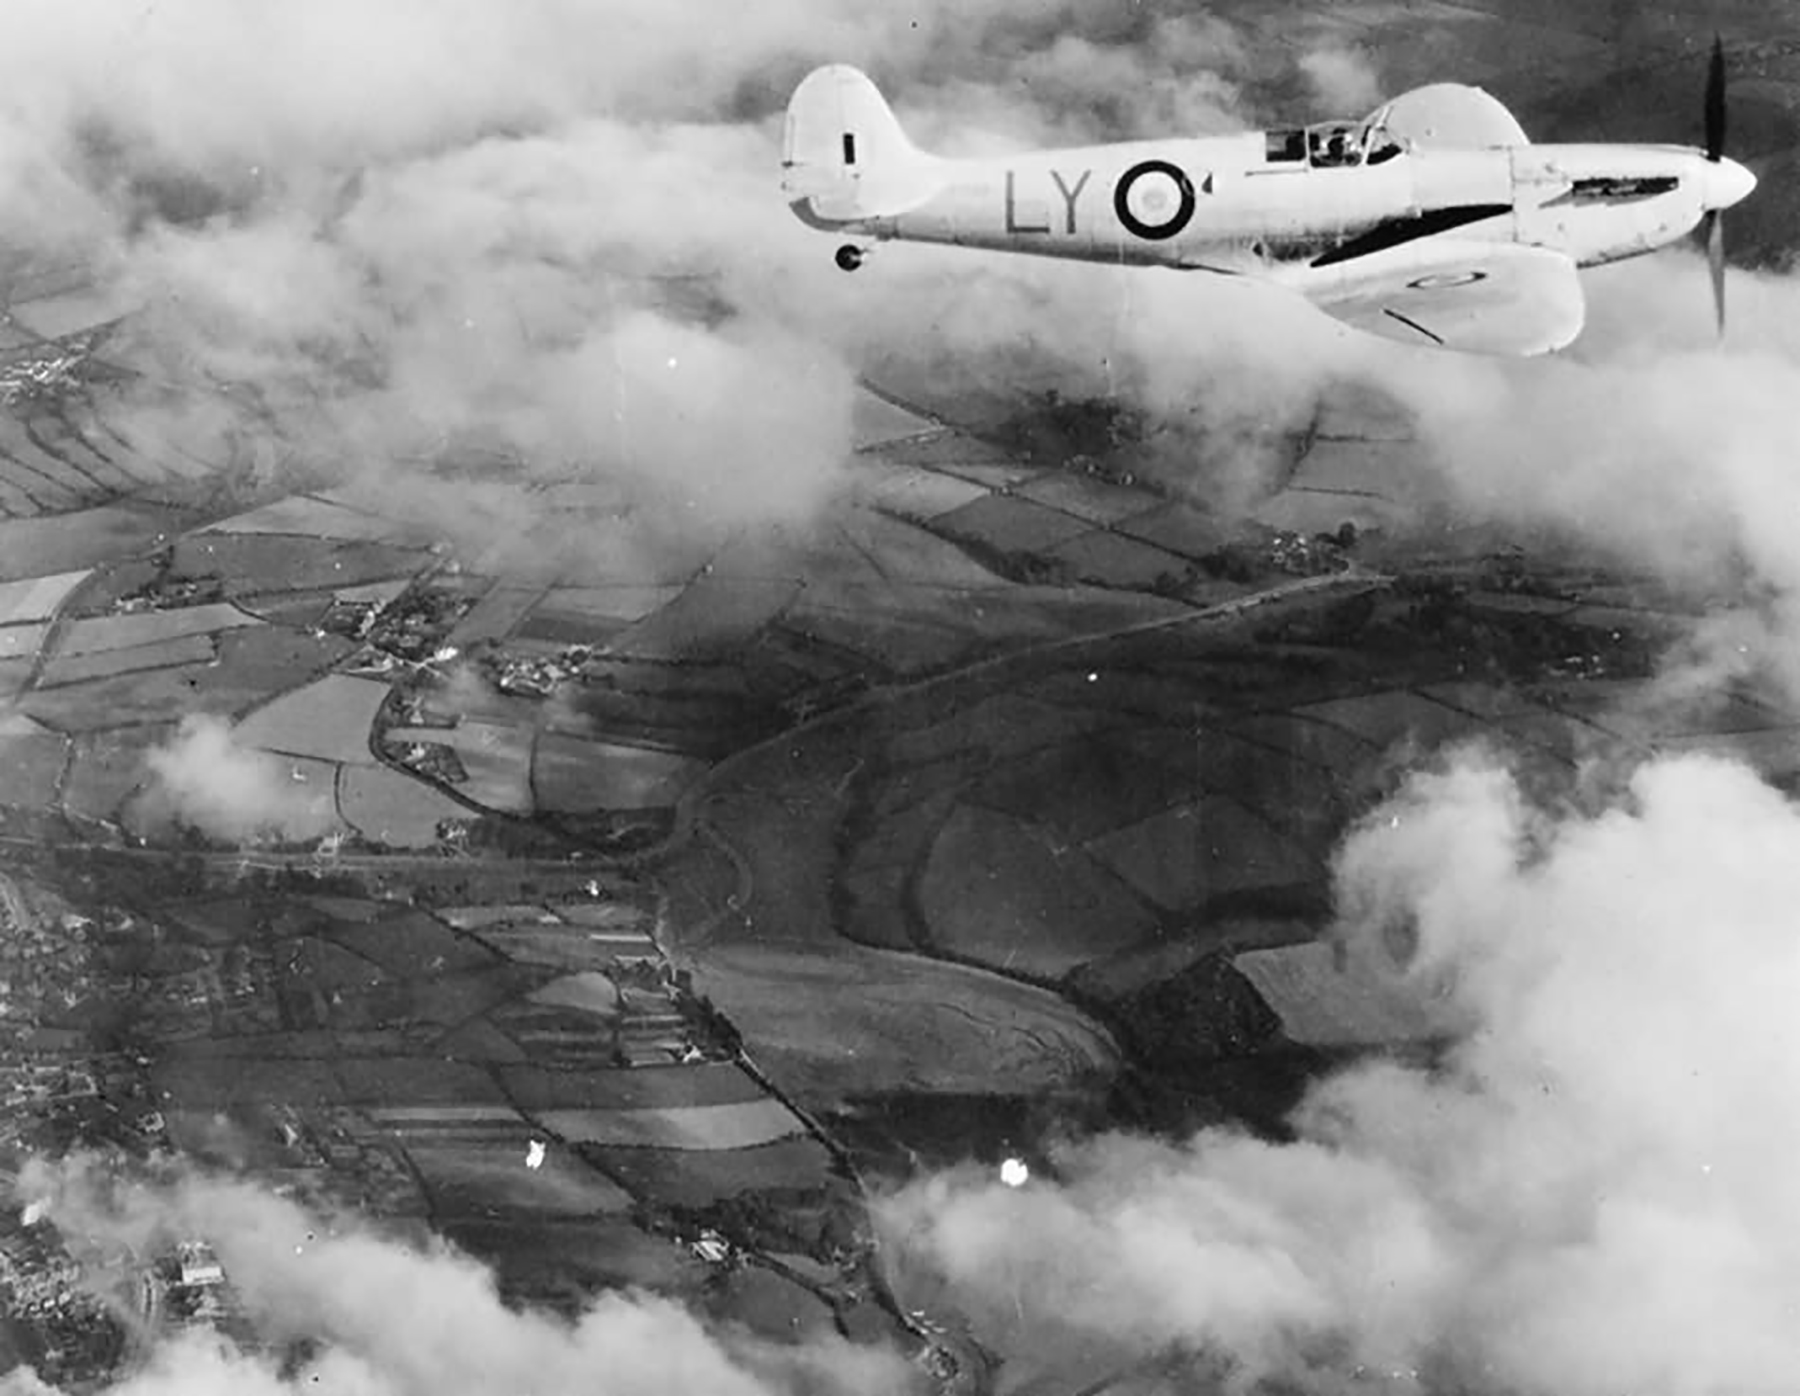 Spitfire PRI RAF 1PRU Photographic Reconnaissance Unit code LY web 01